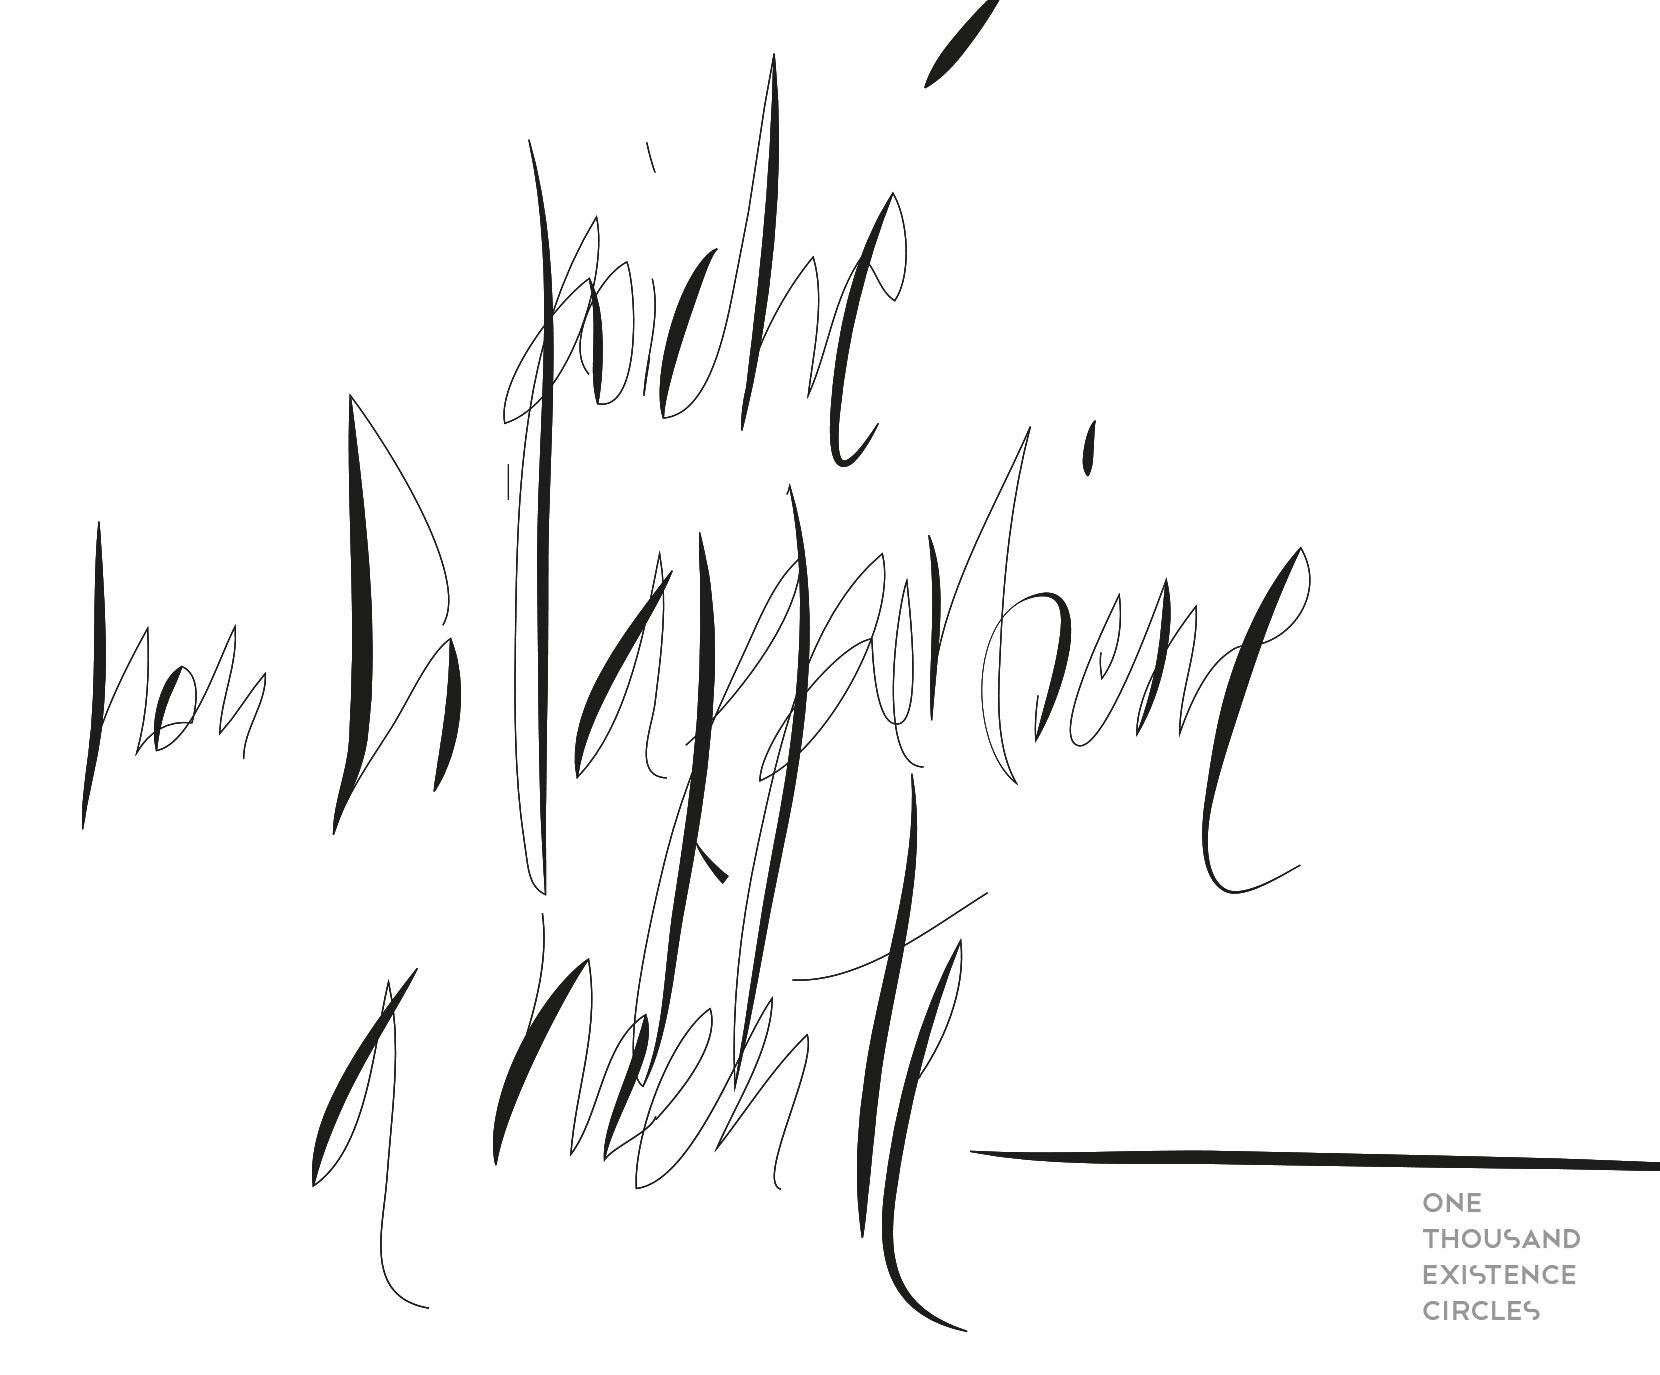 silvio-cocco-art-design-1000circles-3